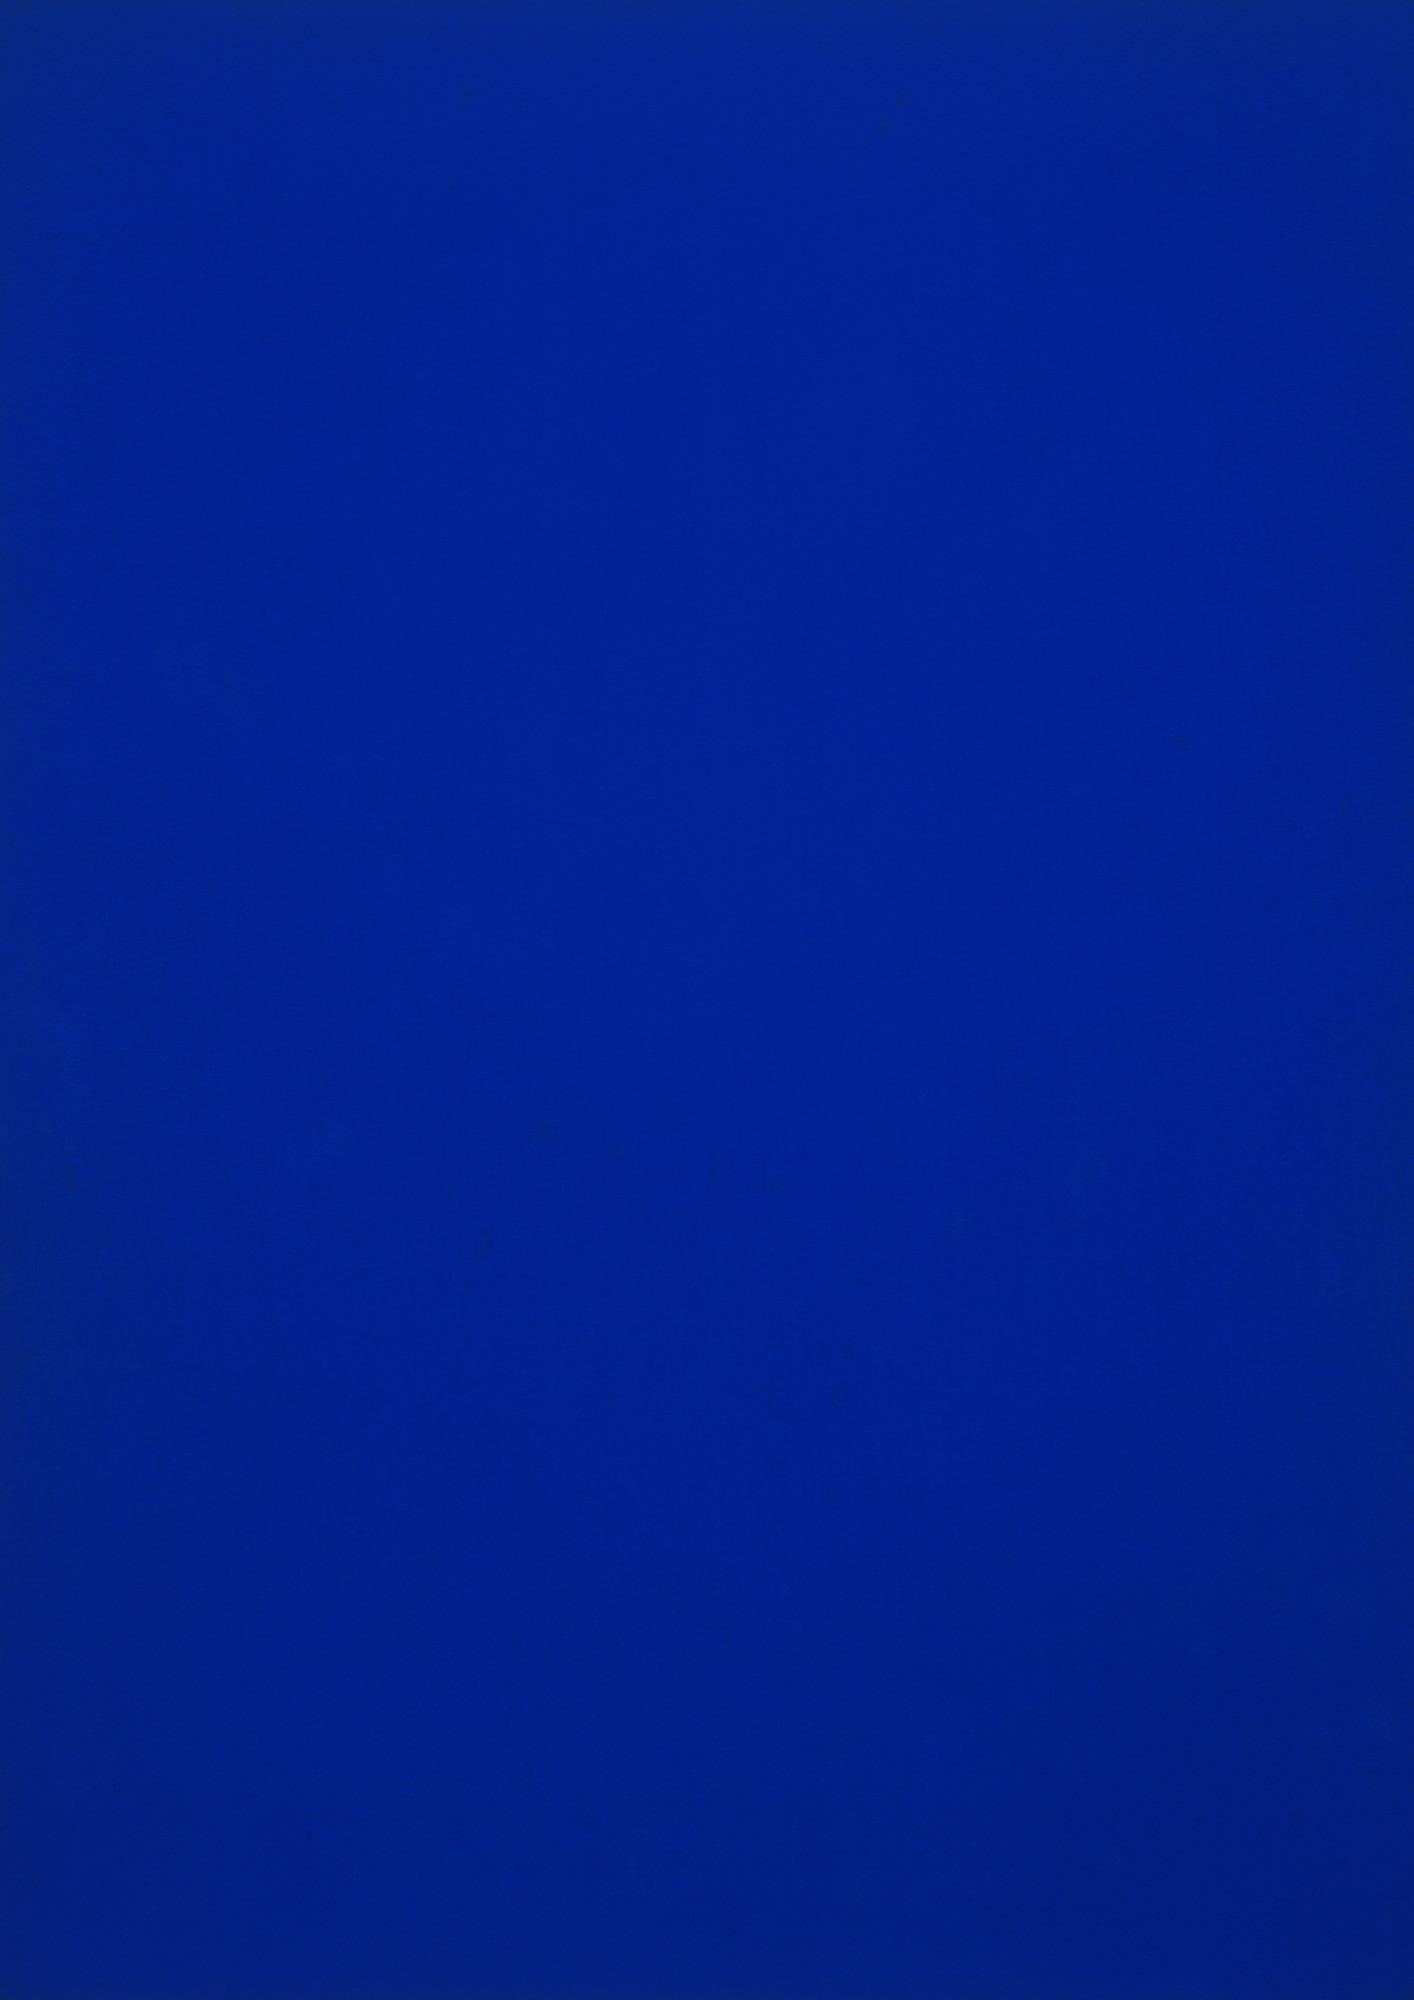 Blue Monochrome (1961) | PC: moma.org